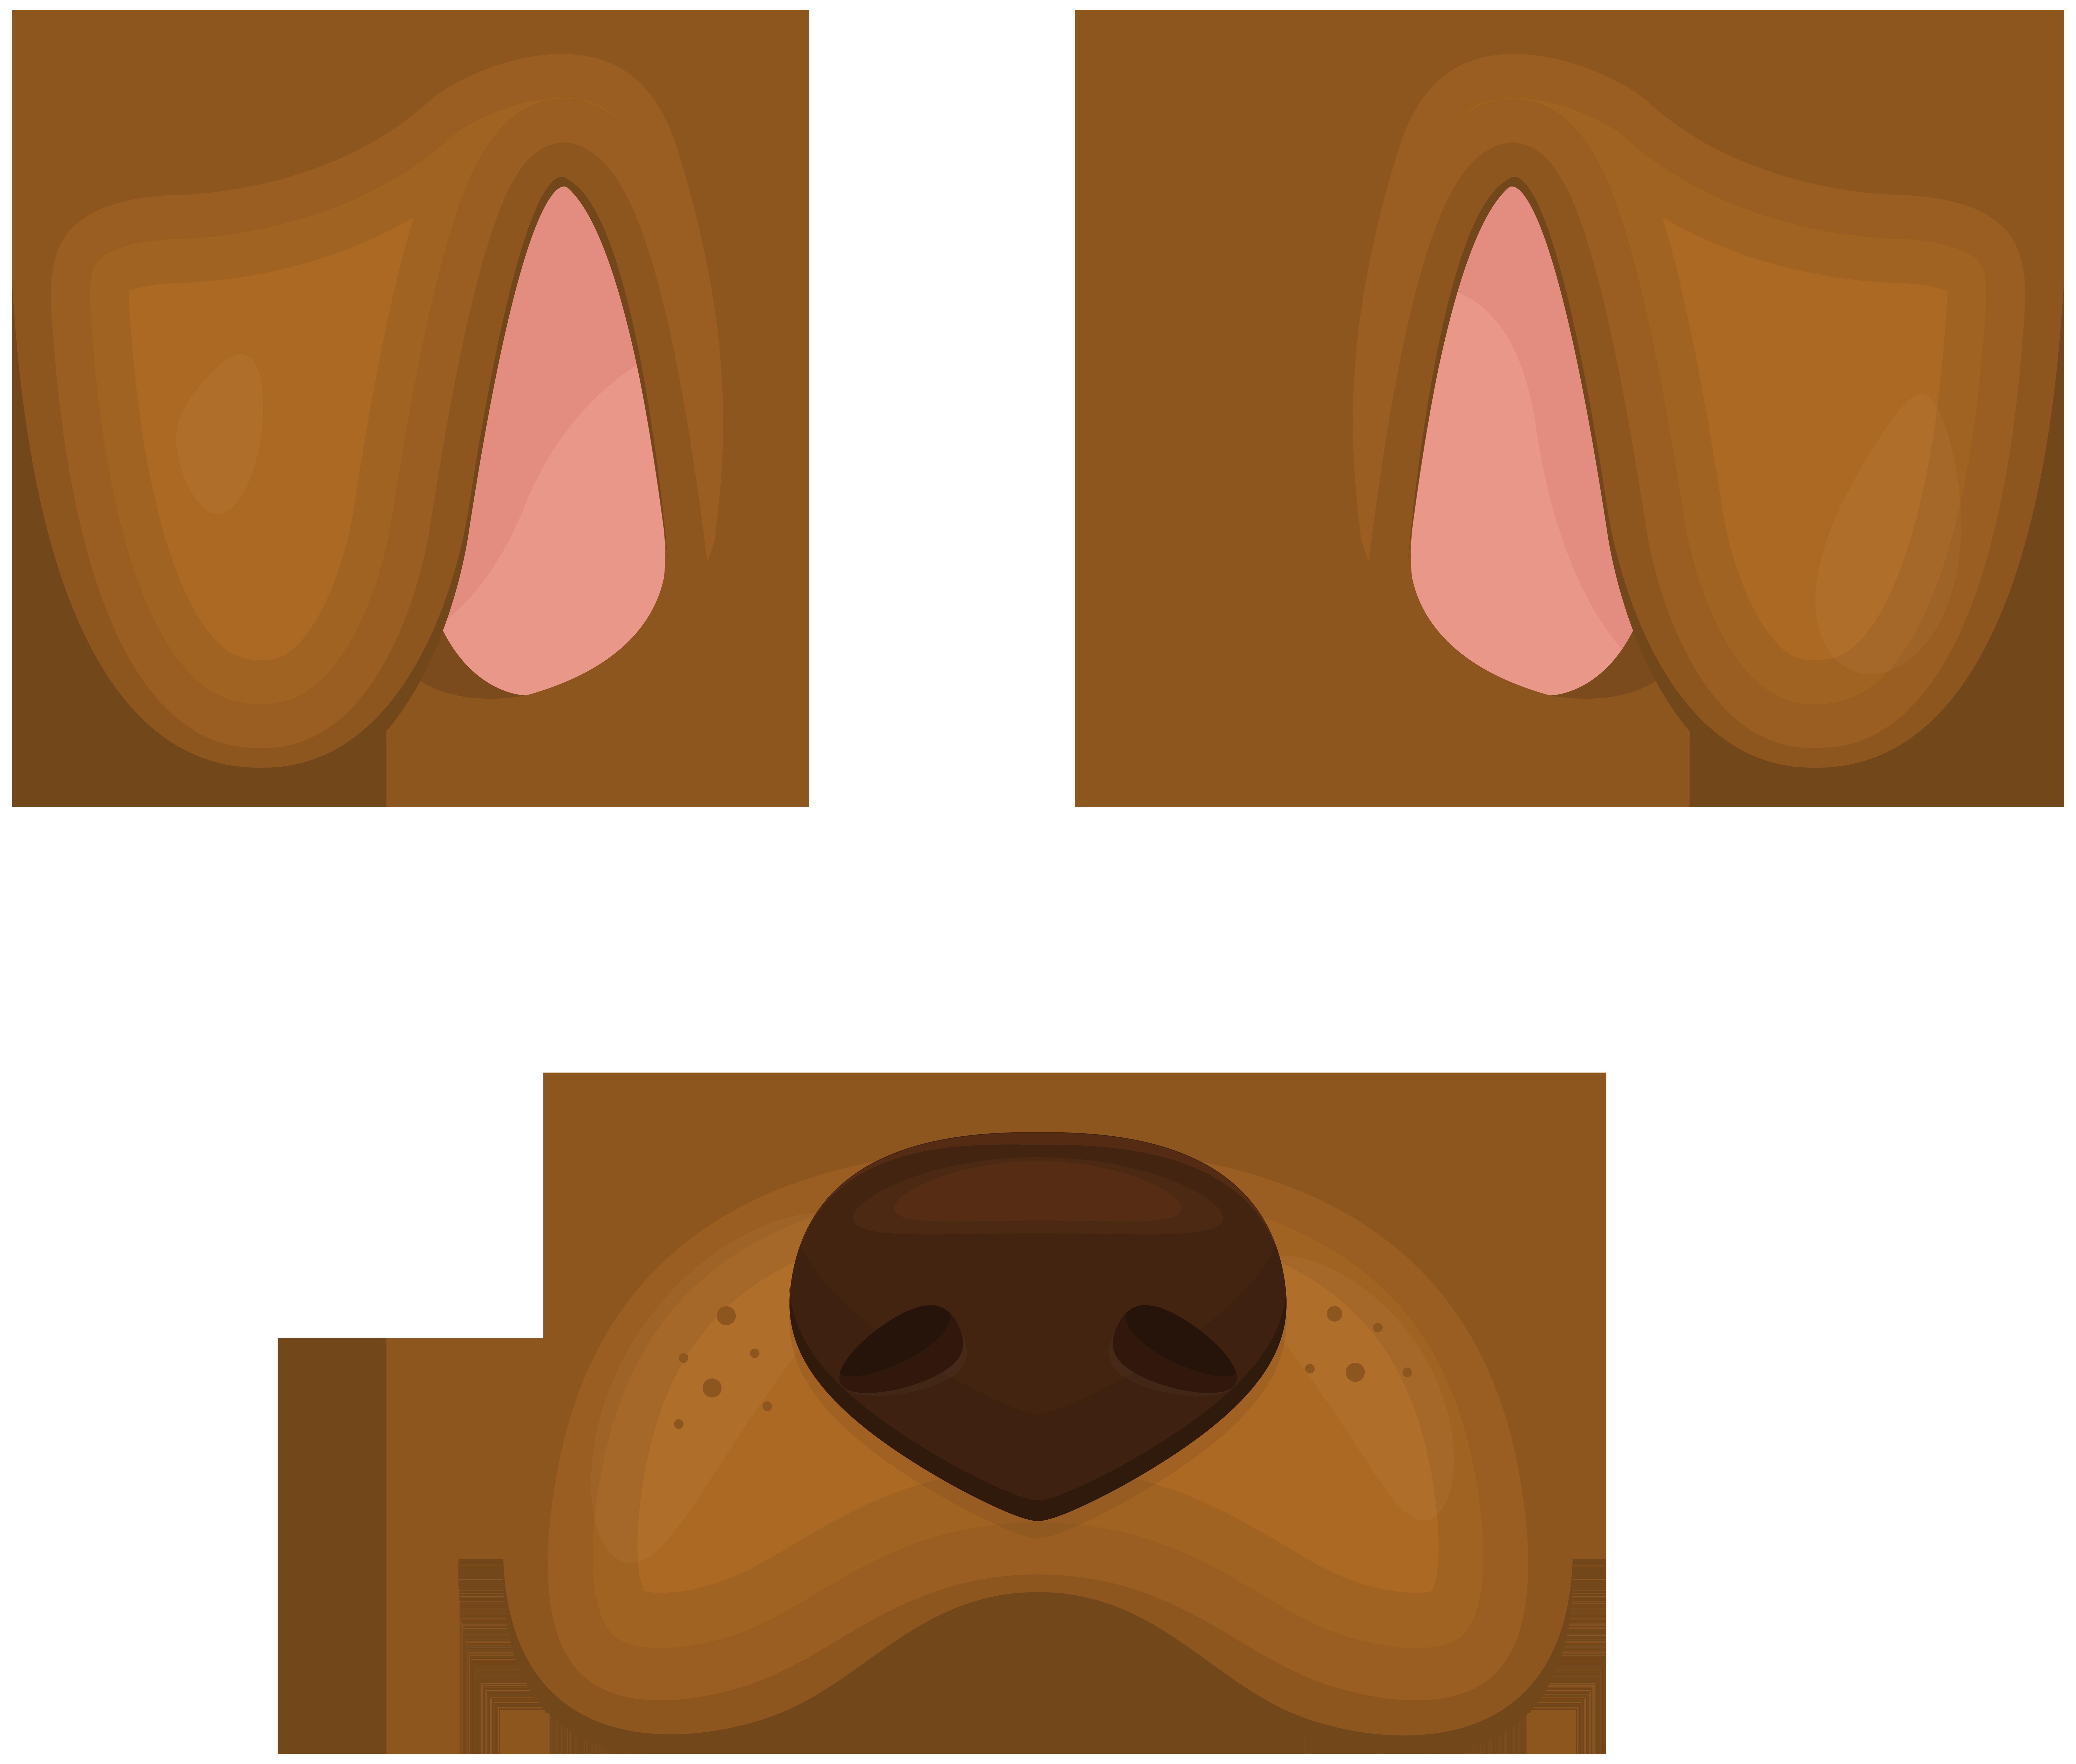 8000x6799 Dog Face Mask Png Clip Art Imageu200b Gallery Yopriceville